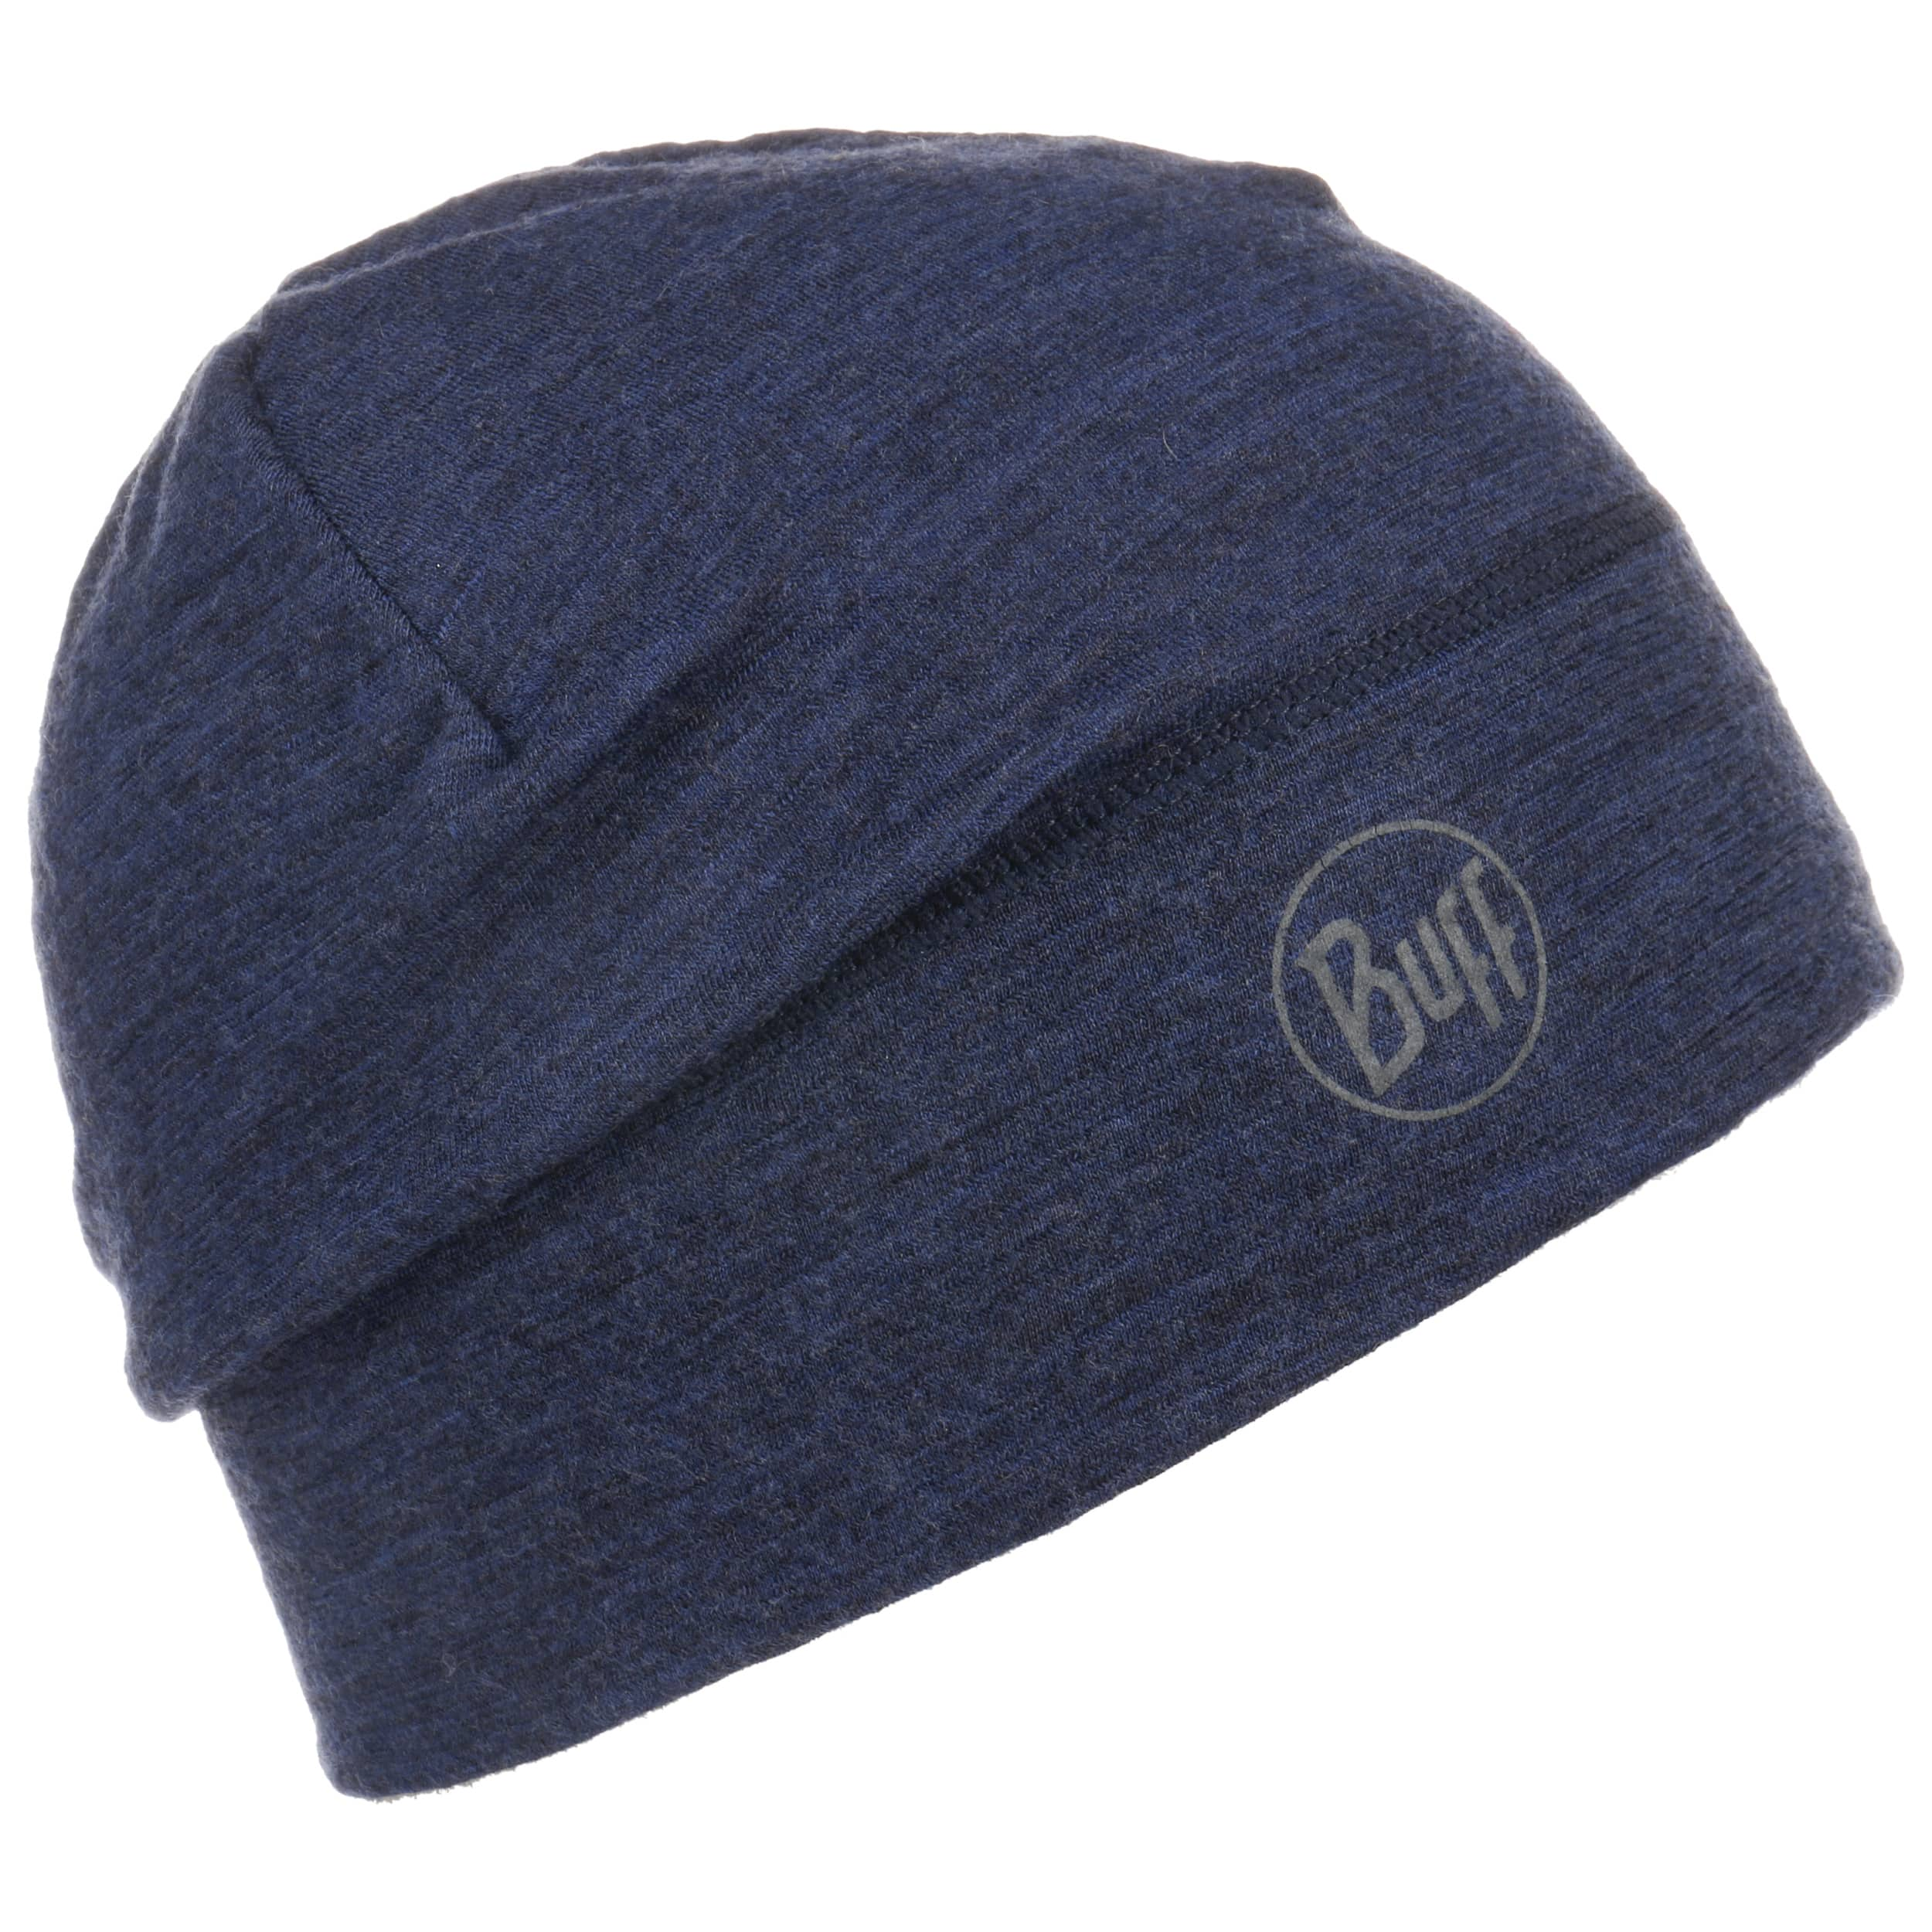 États Unis vif et grand en style achat original Bonnet Merino Wool One-Layer by BUFF